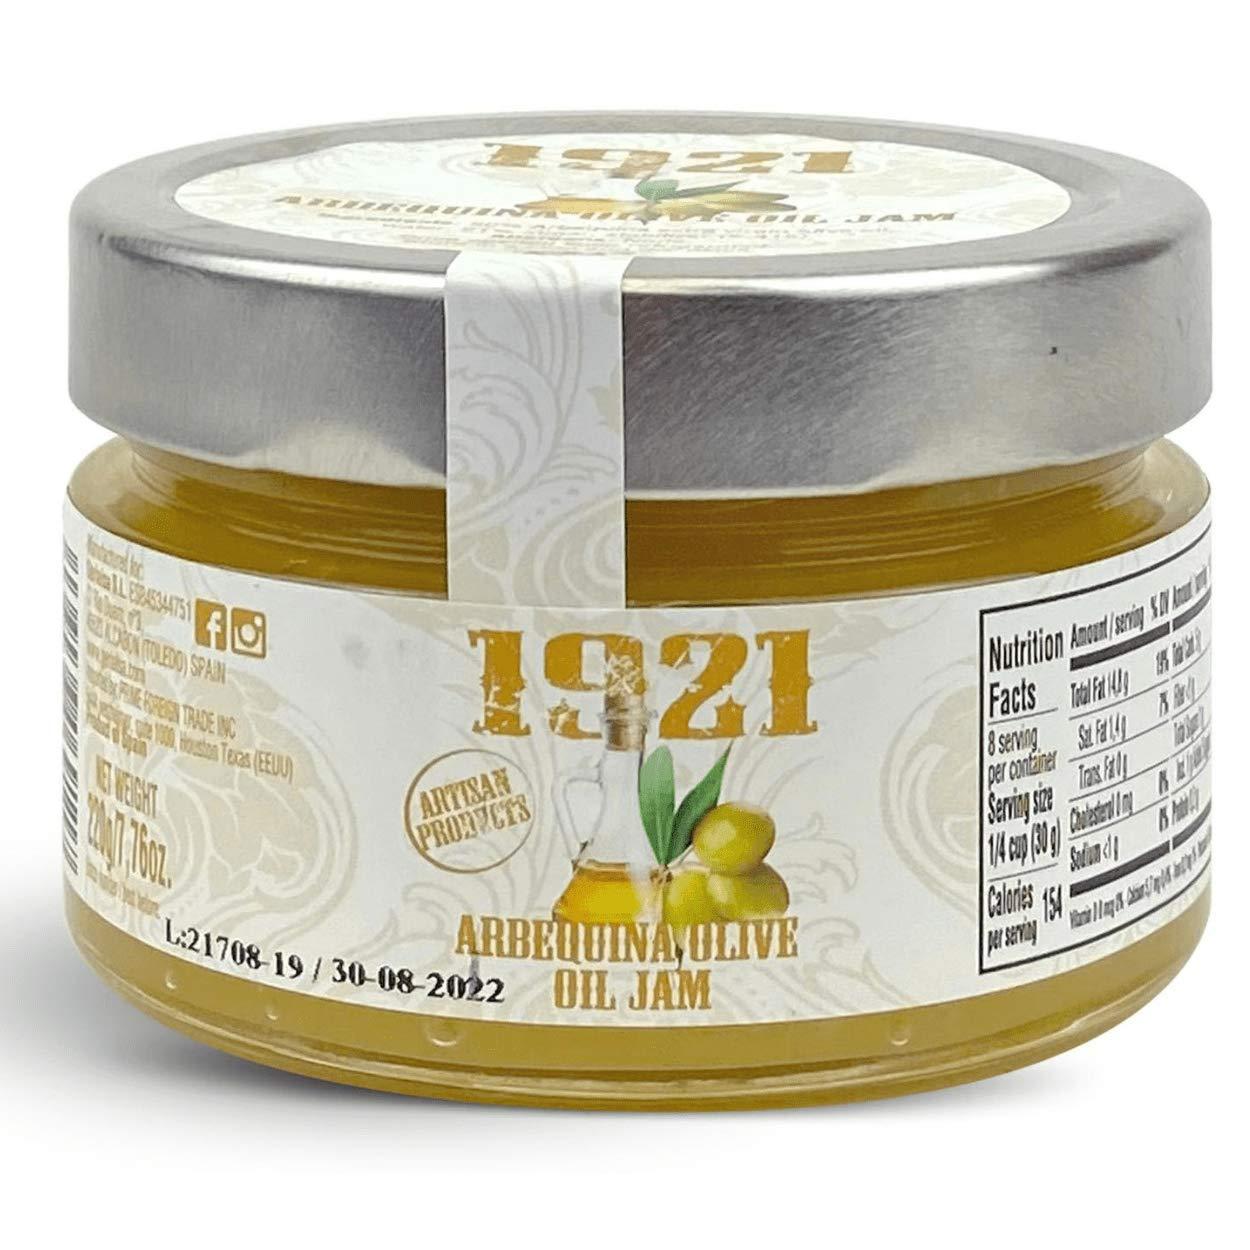 Spanish Arbequina Extra Virgin Olive Oil of f Max Rare 46% OFF 7.76oz Jam amazing